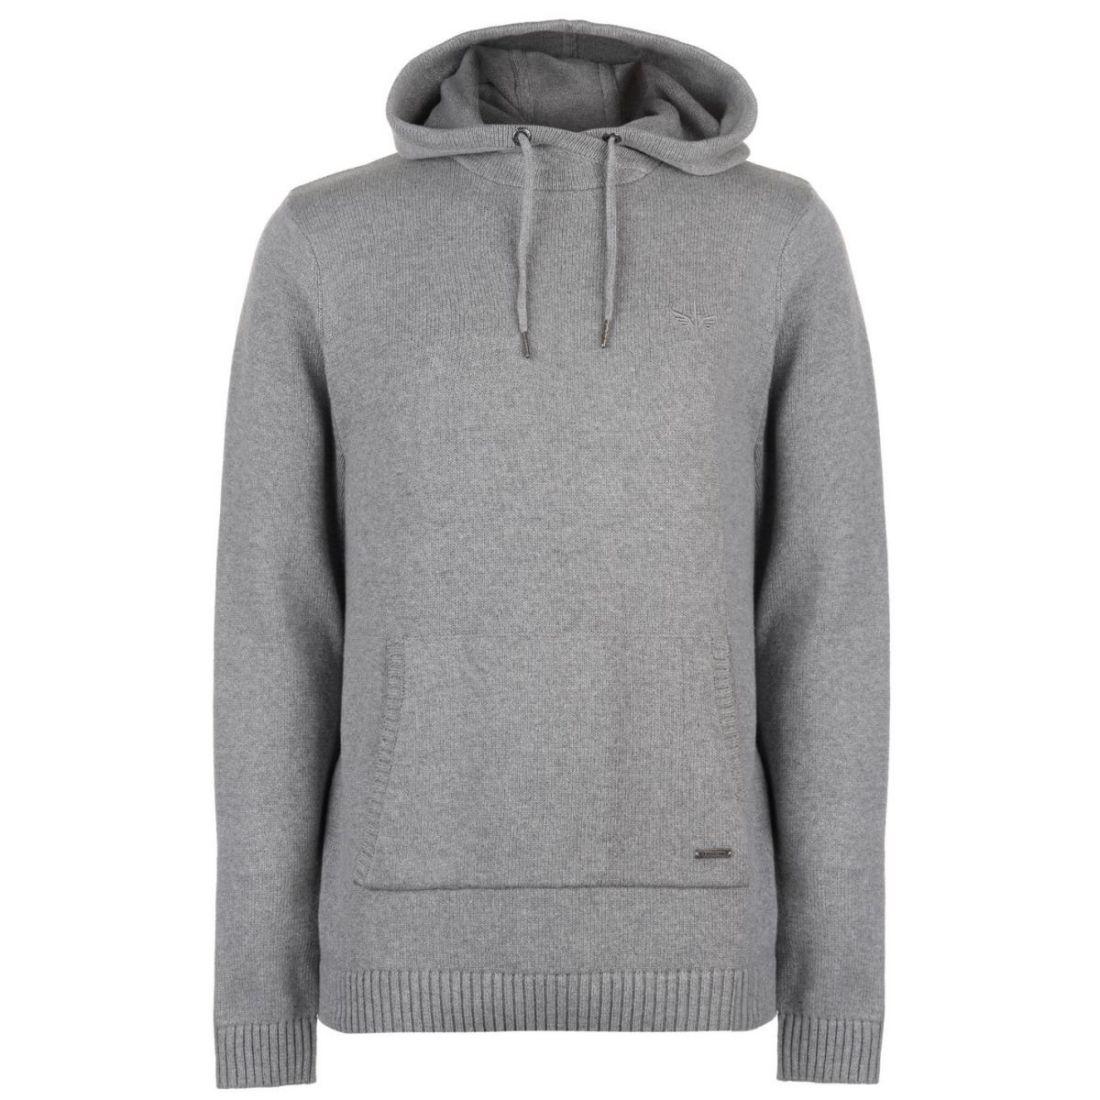 0e3b66c619 Firetrap Mens Hooded Knit Jumper Sweater Pullover Long Sleeve Cotton ...